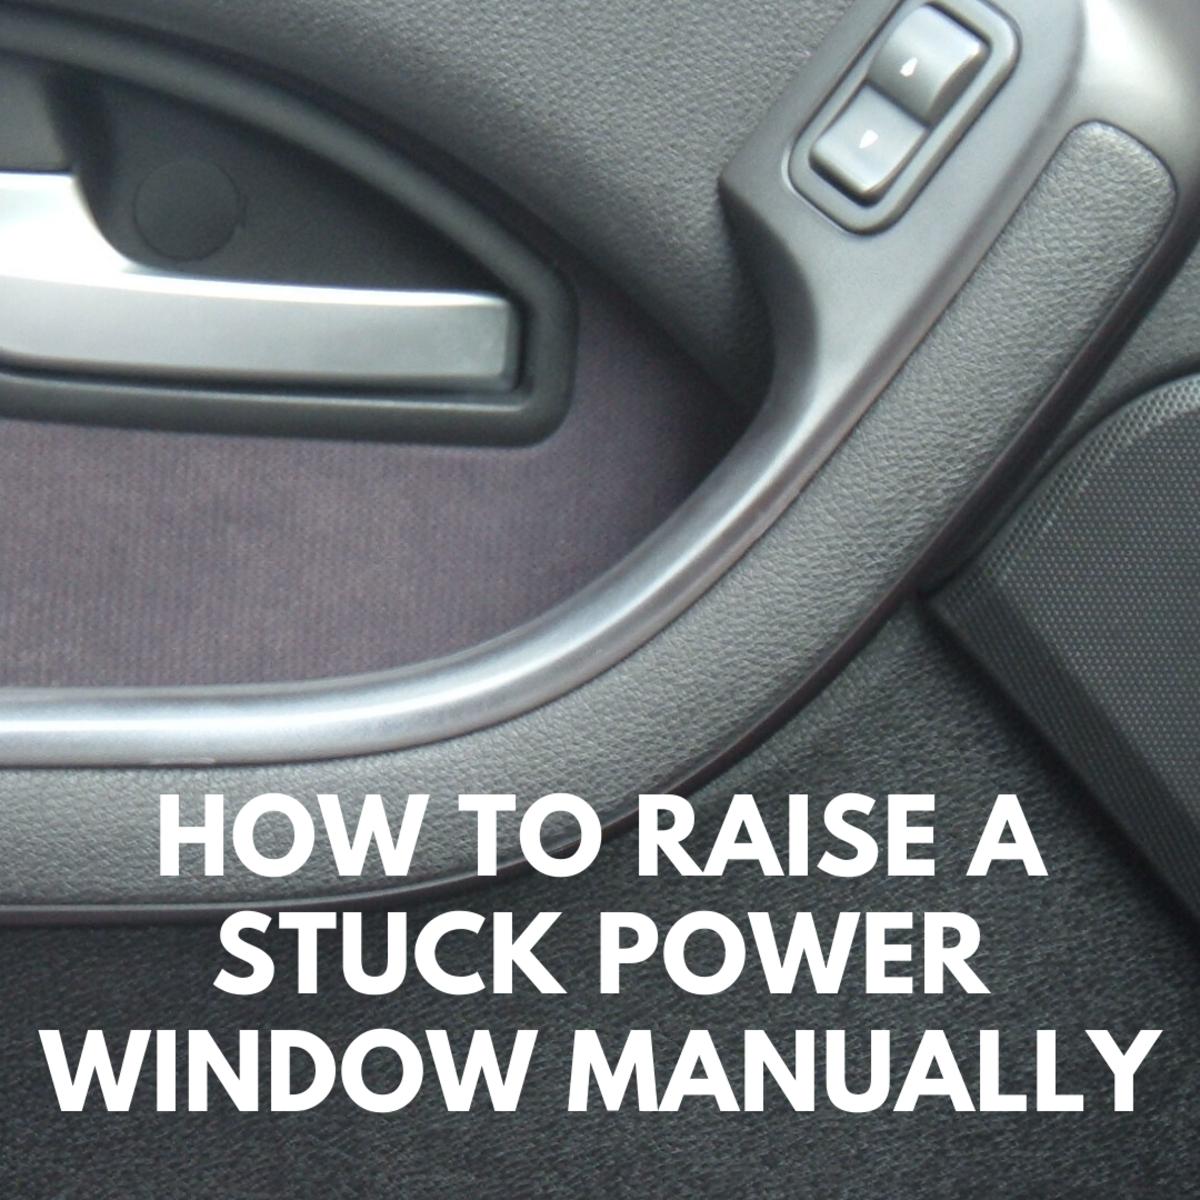 How to Raise a Stuck Power Window Manually